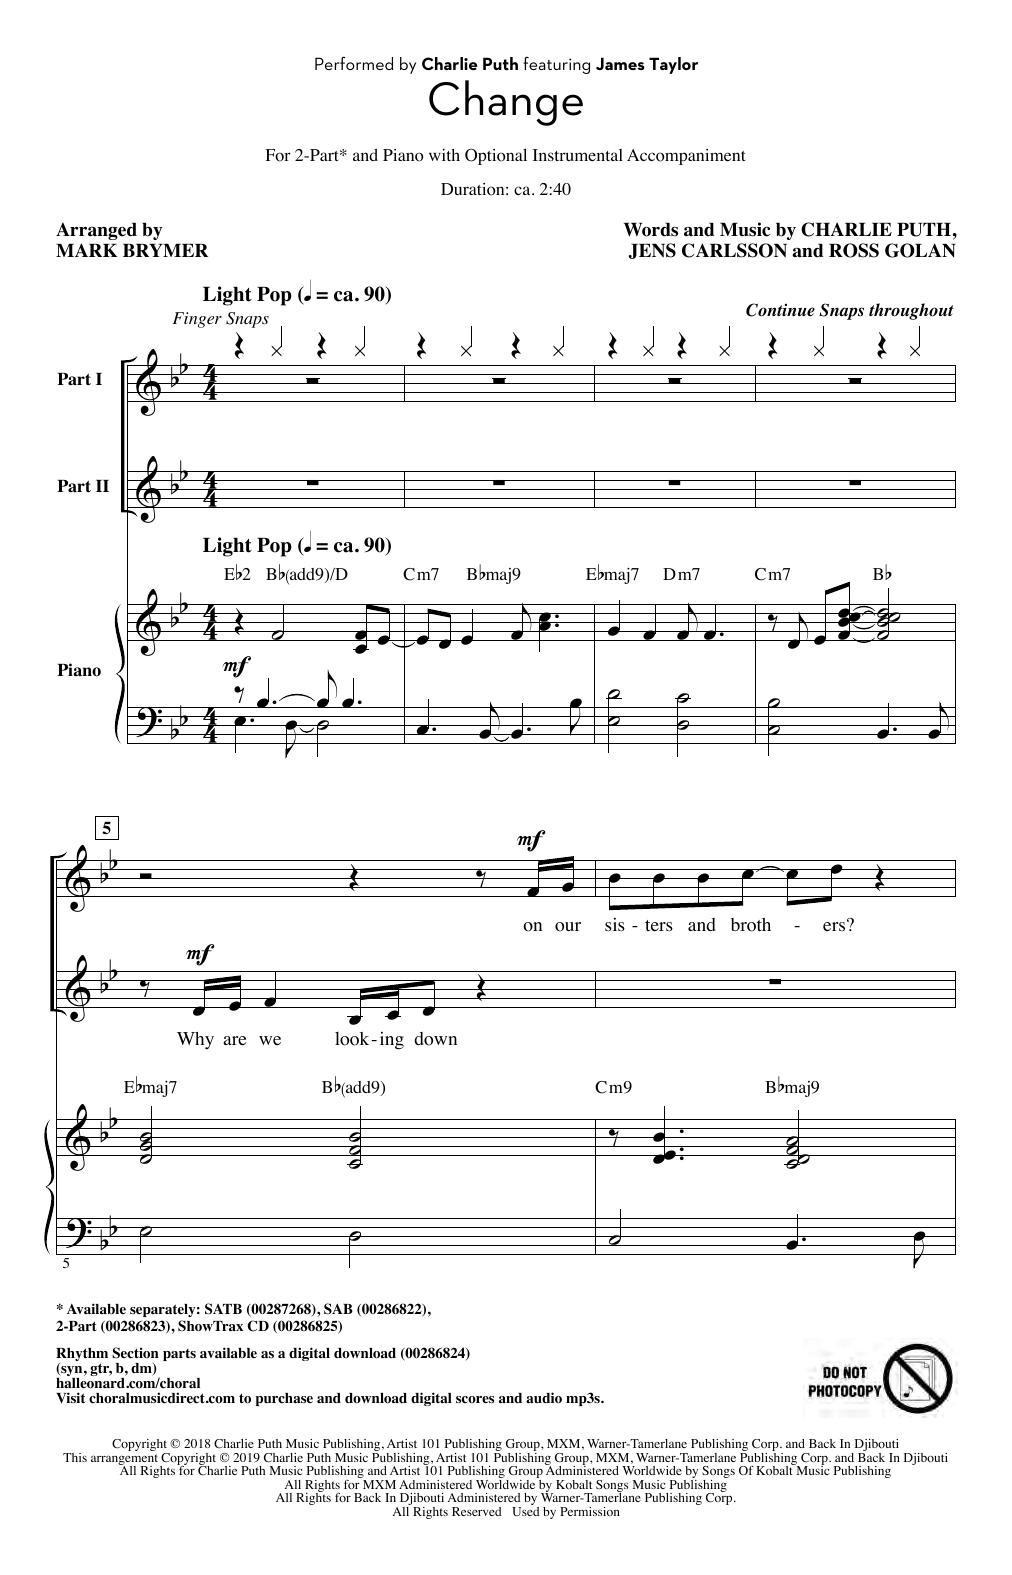 Partition chorale Change (feat. James Taylor) (arr. Mark Brymer) de Charlie Puth - 2 voix